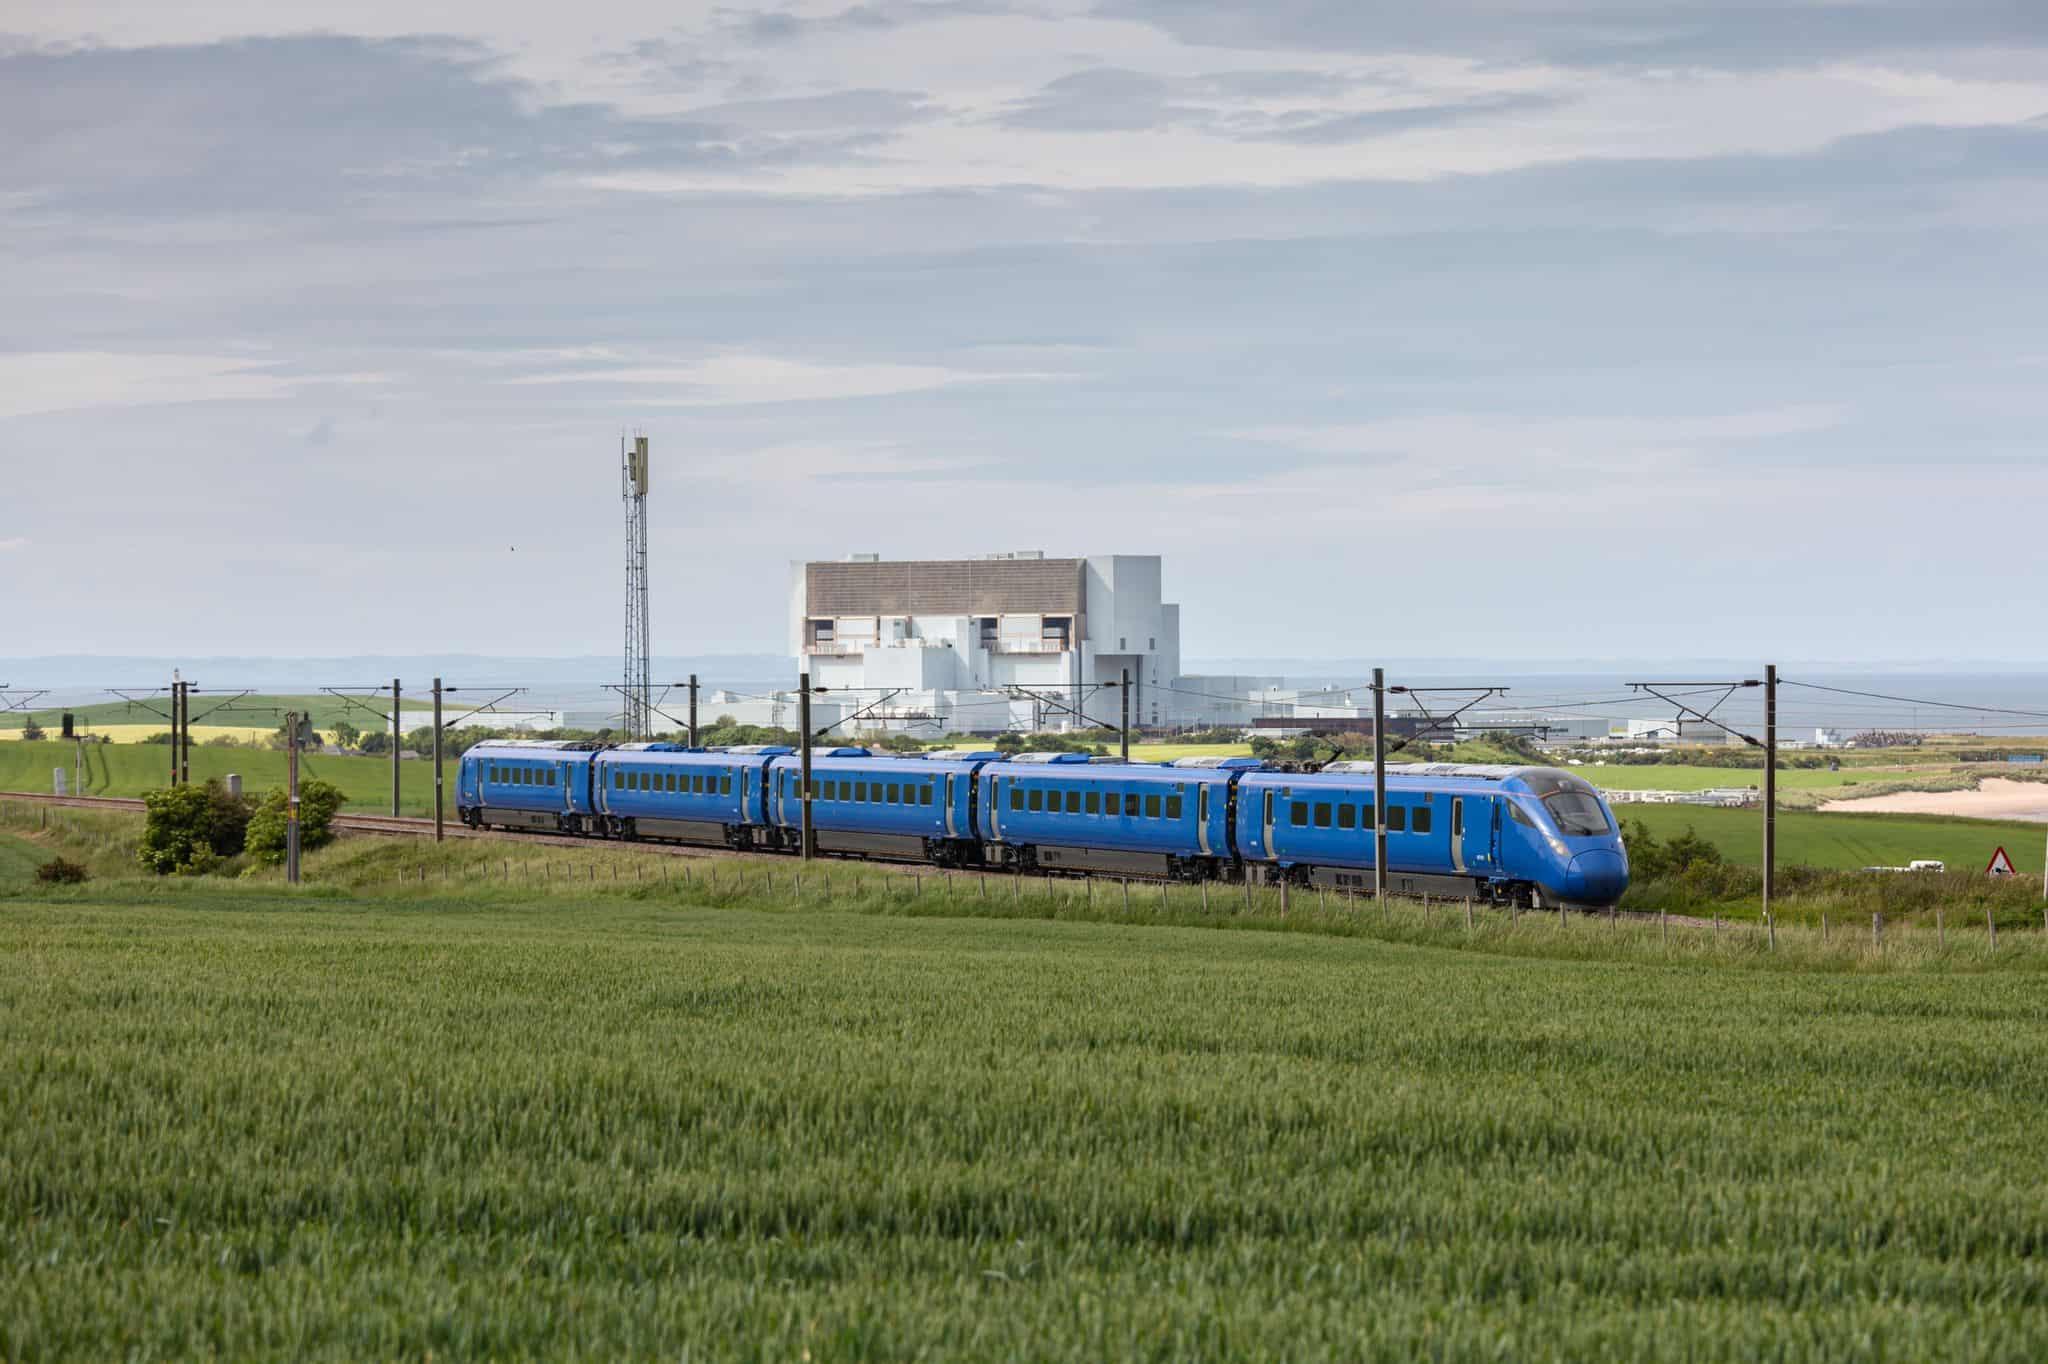 recorrido-de-Lumo-tren-eléctrico-que-unirá-Londres-Edimburgo